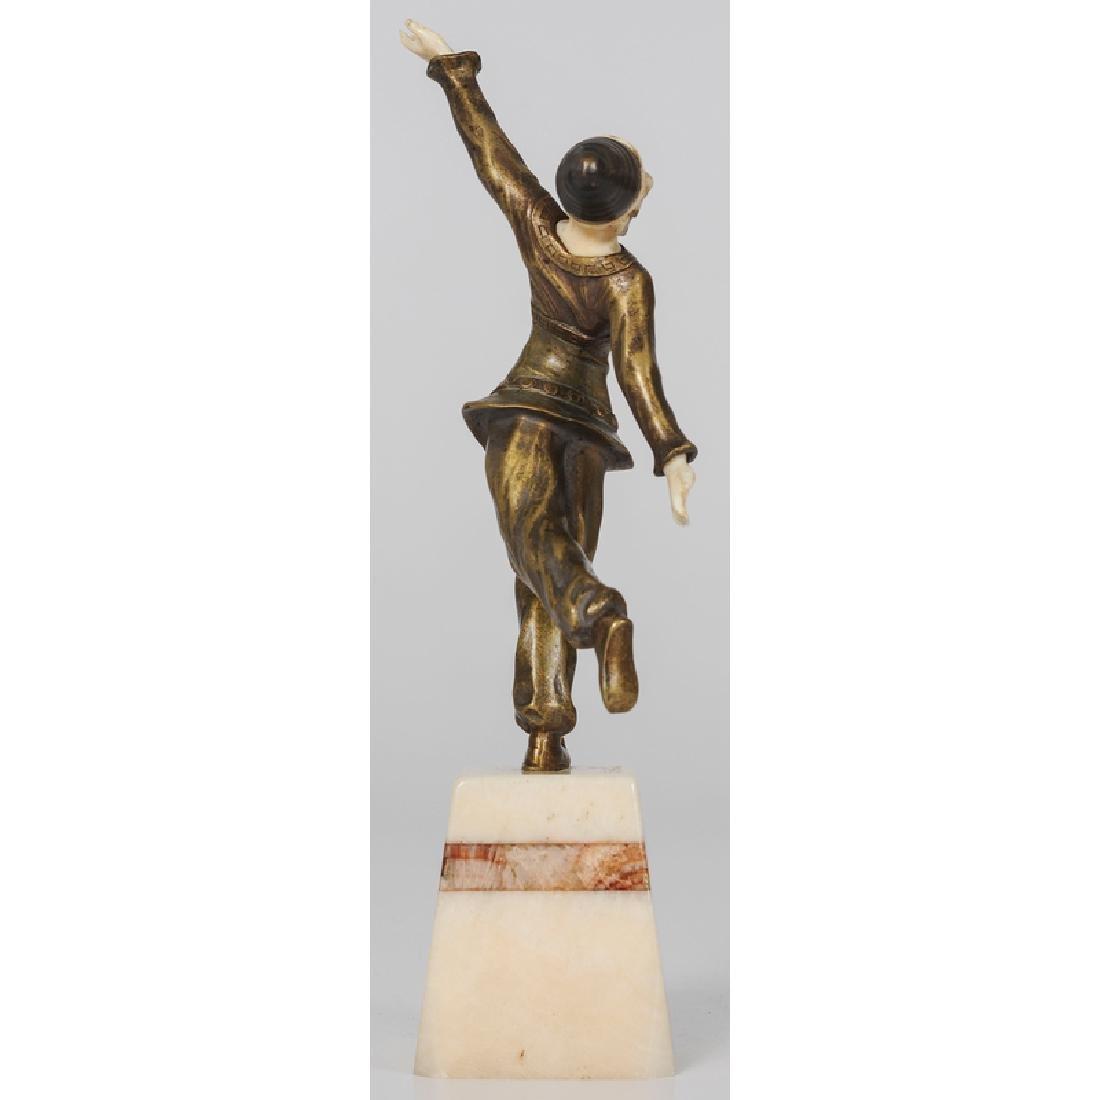 Ivory and Bronze Sculpture Signed Solange Bertrand - 3